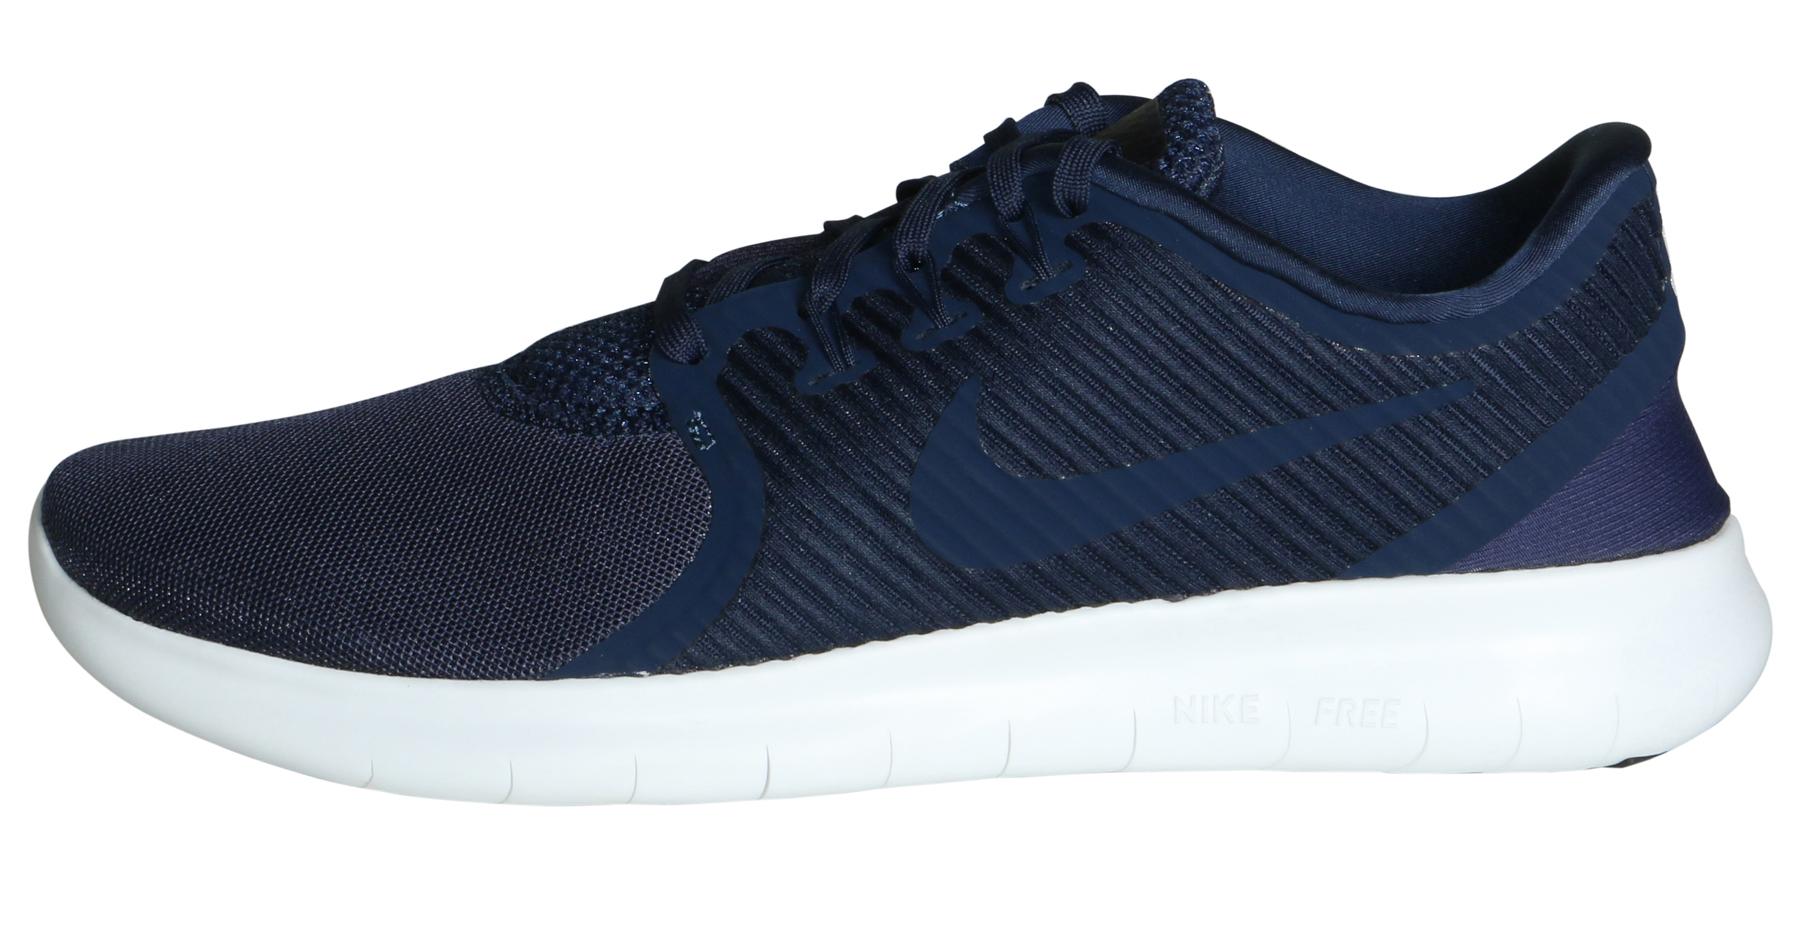 premium selection 211e2 d52a2 ... Nike Nike Nike Men s Fre RN Commuter Running Shoes-Obsidian-9.5 9d4676  ...